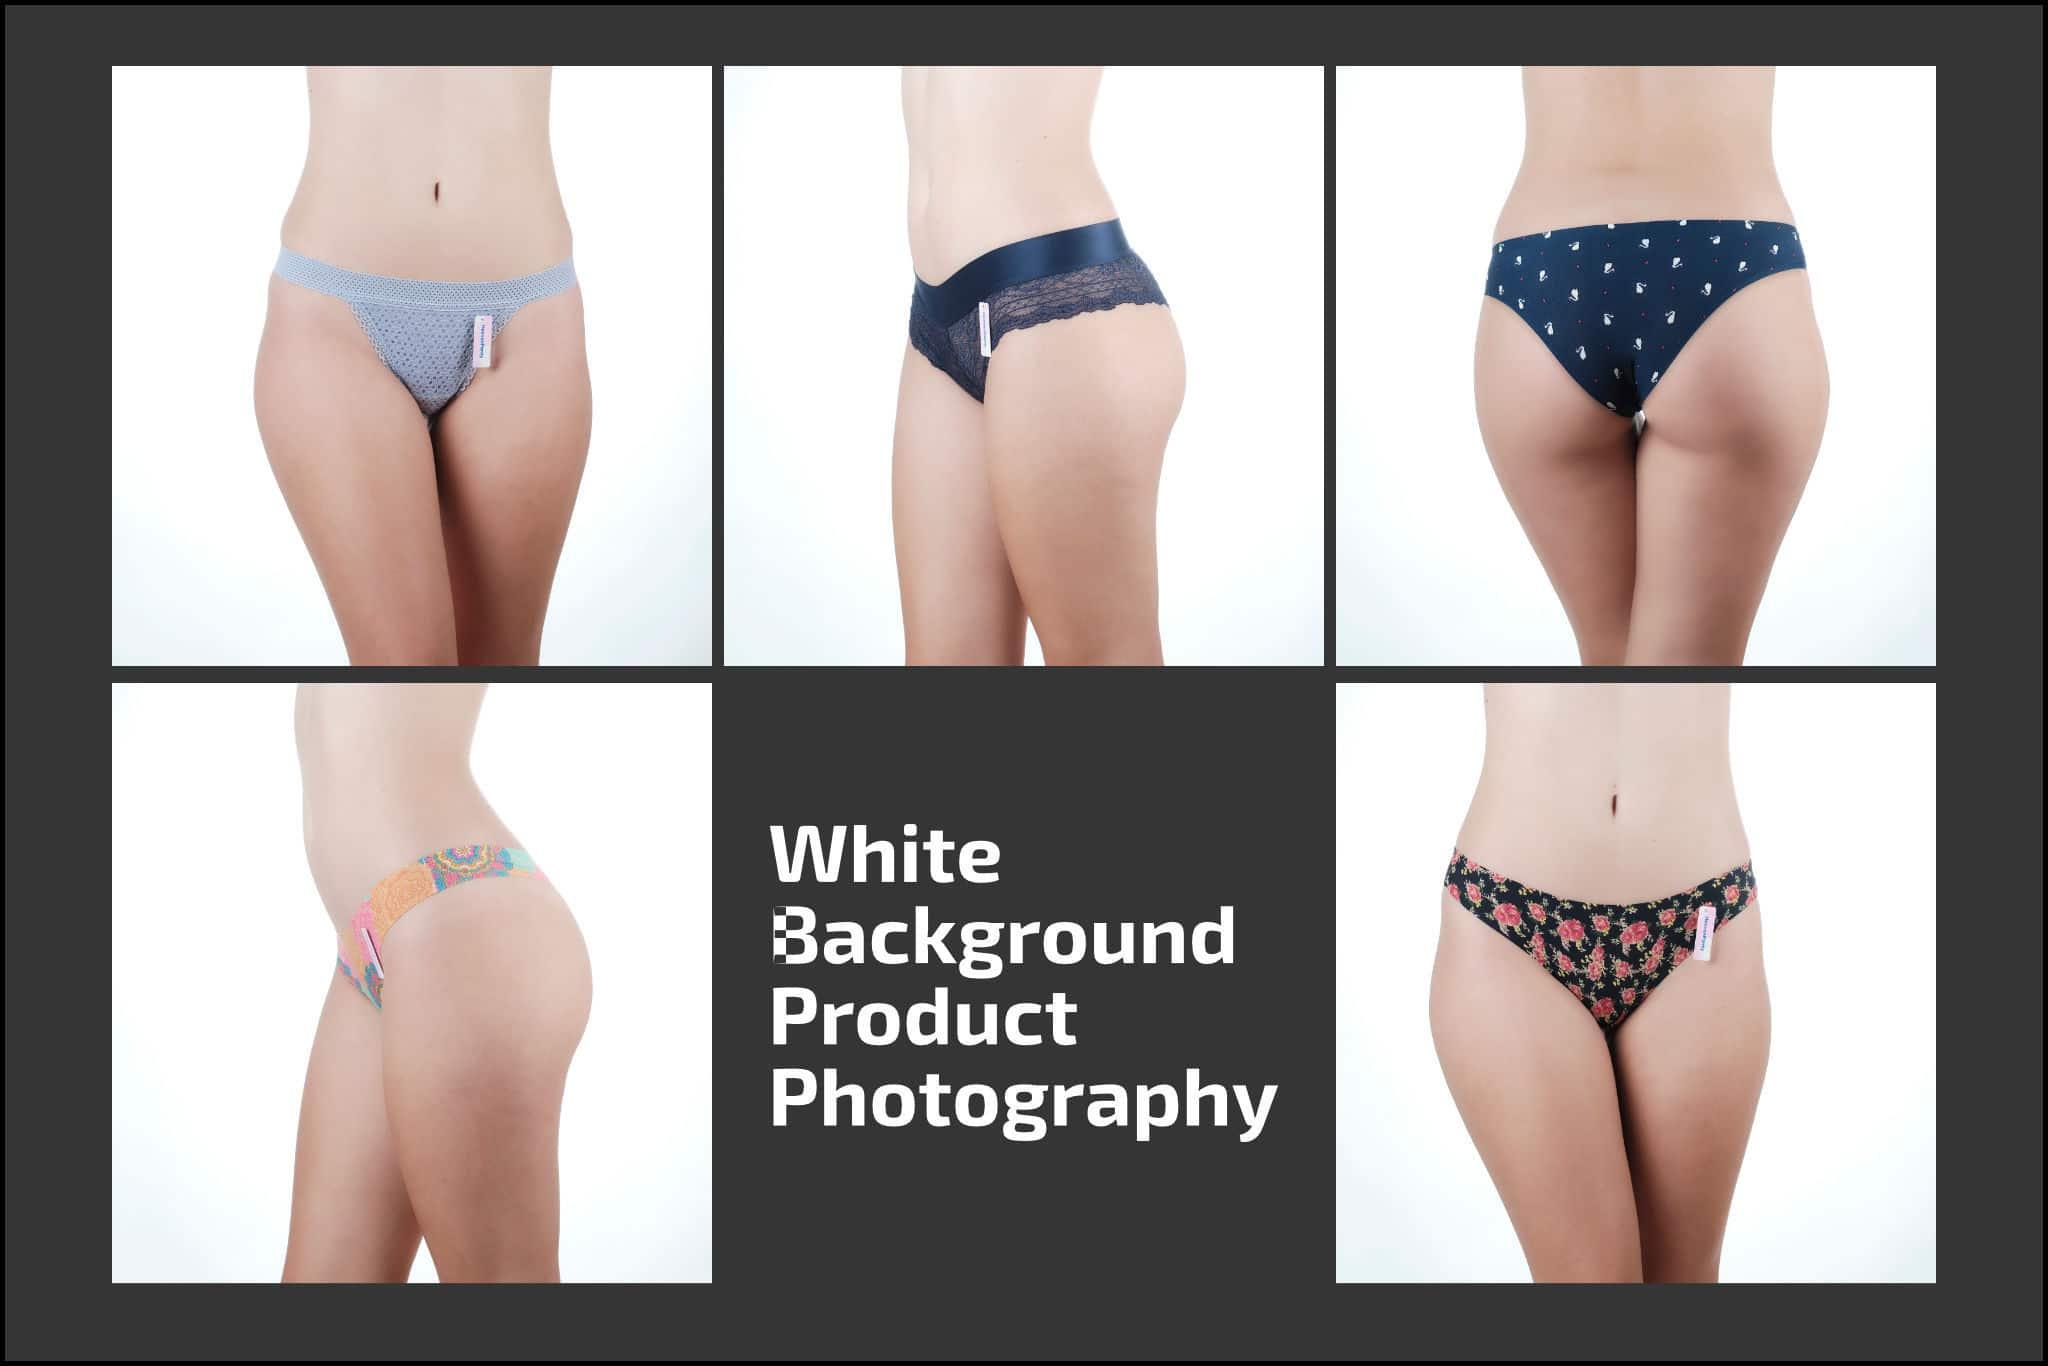 White Background Product Photography